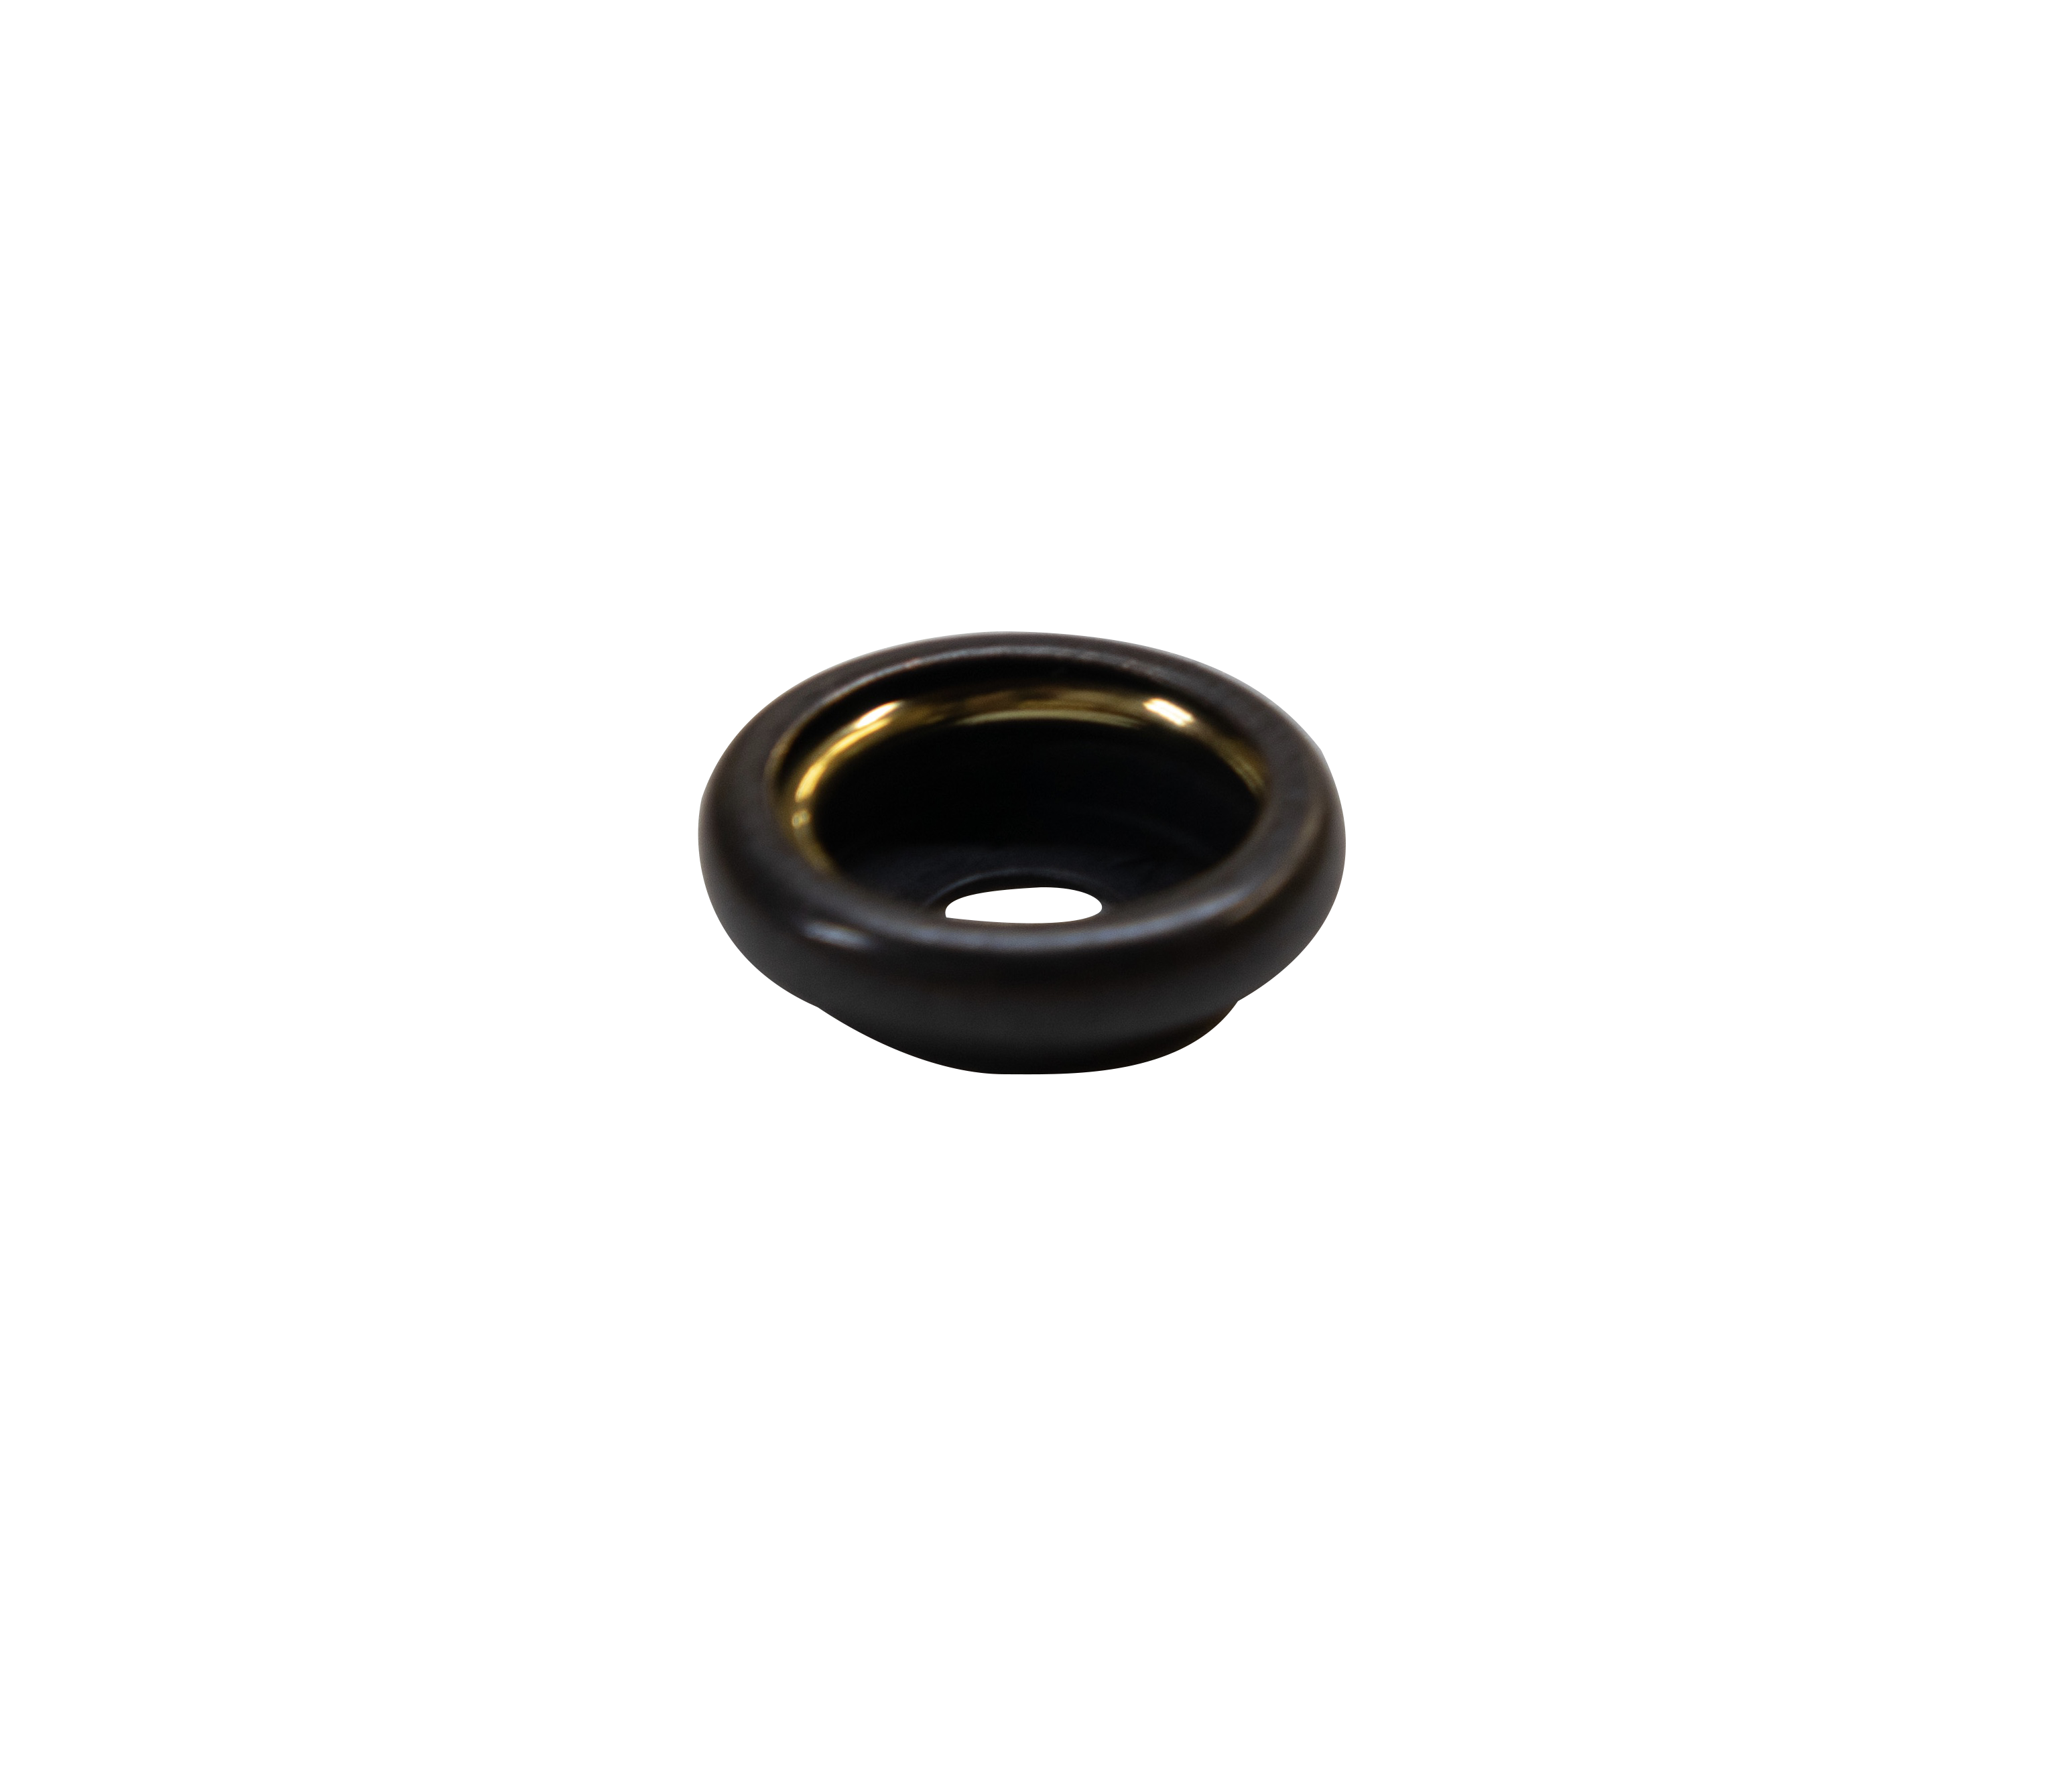 Black Durable Socket